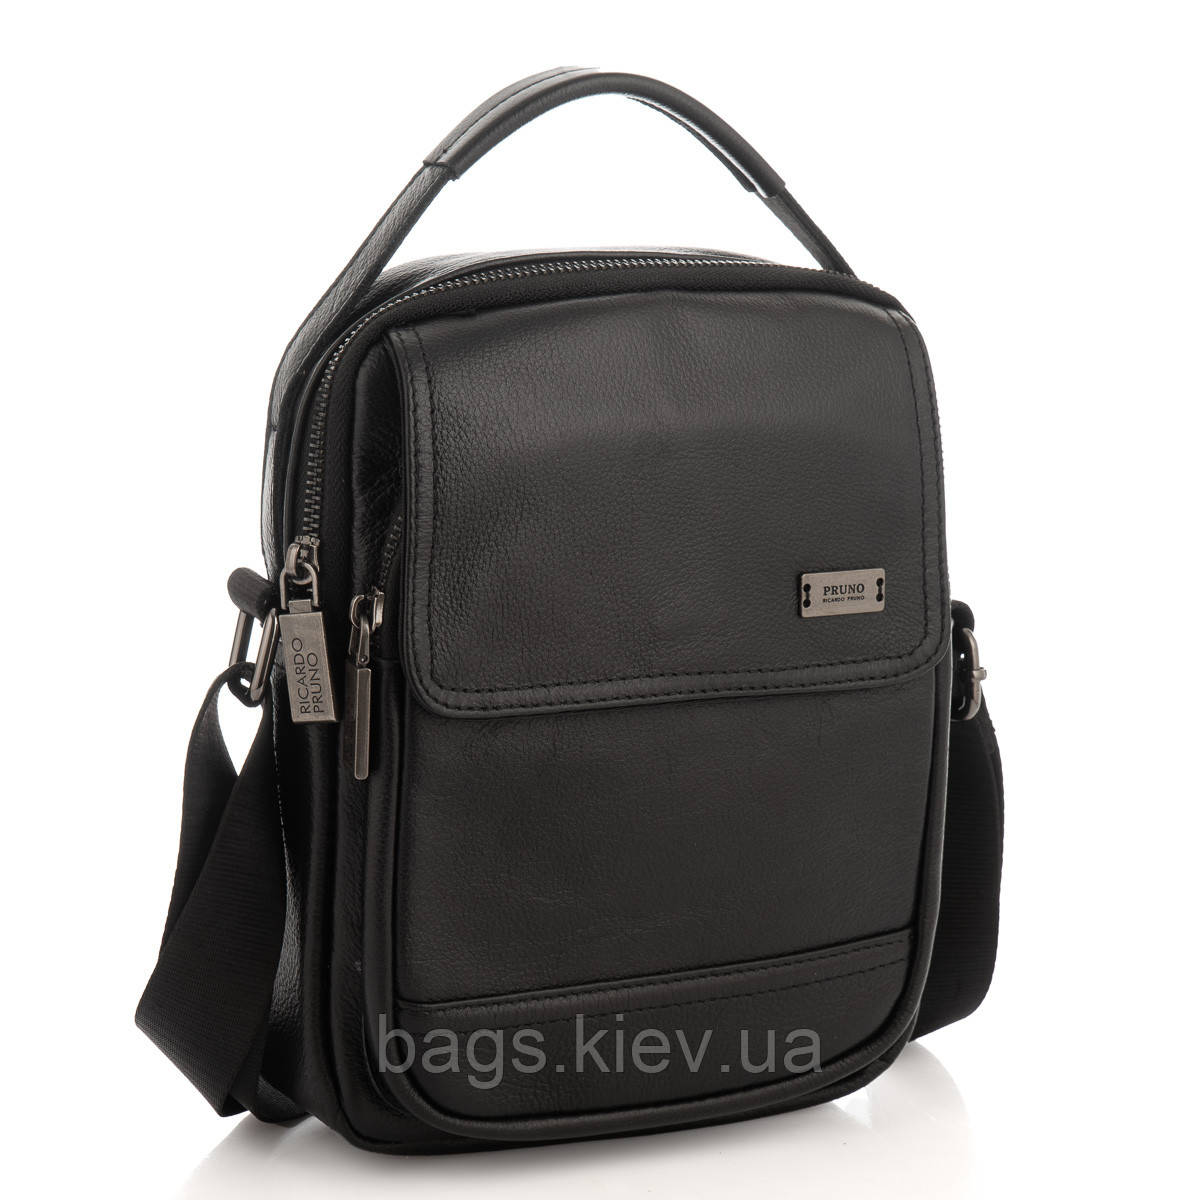 Мужская сумка через плечо натуральная кожа Ricardo Pruno RP23-2301A